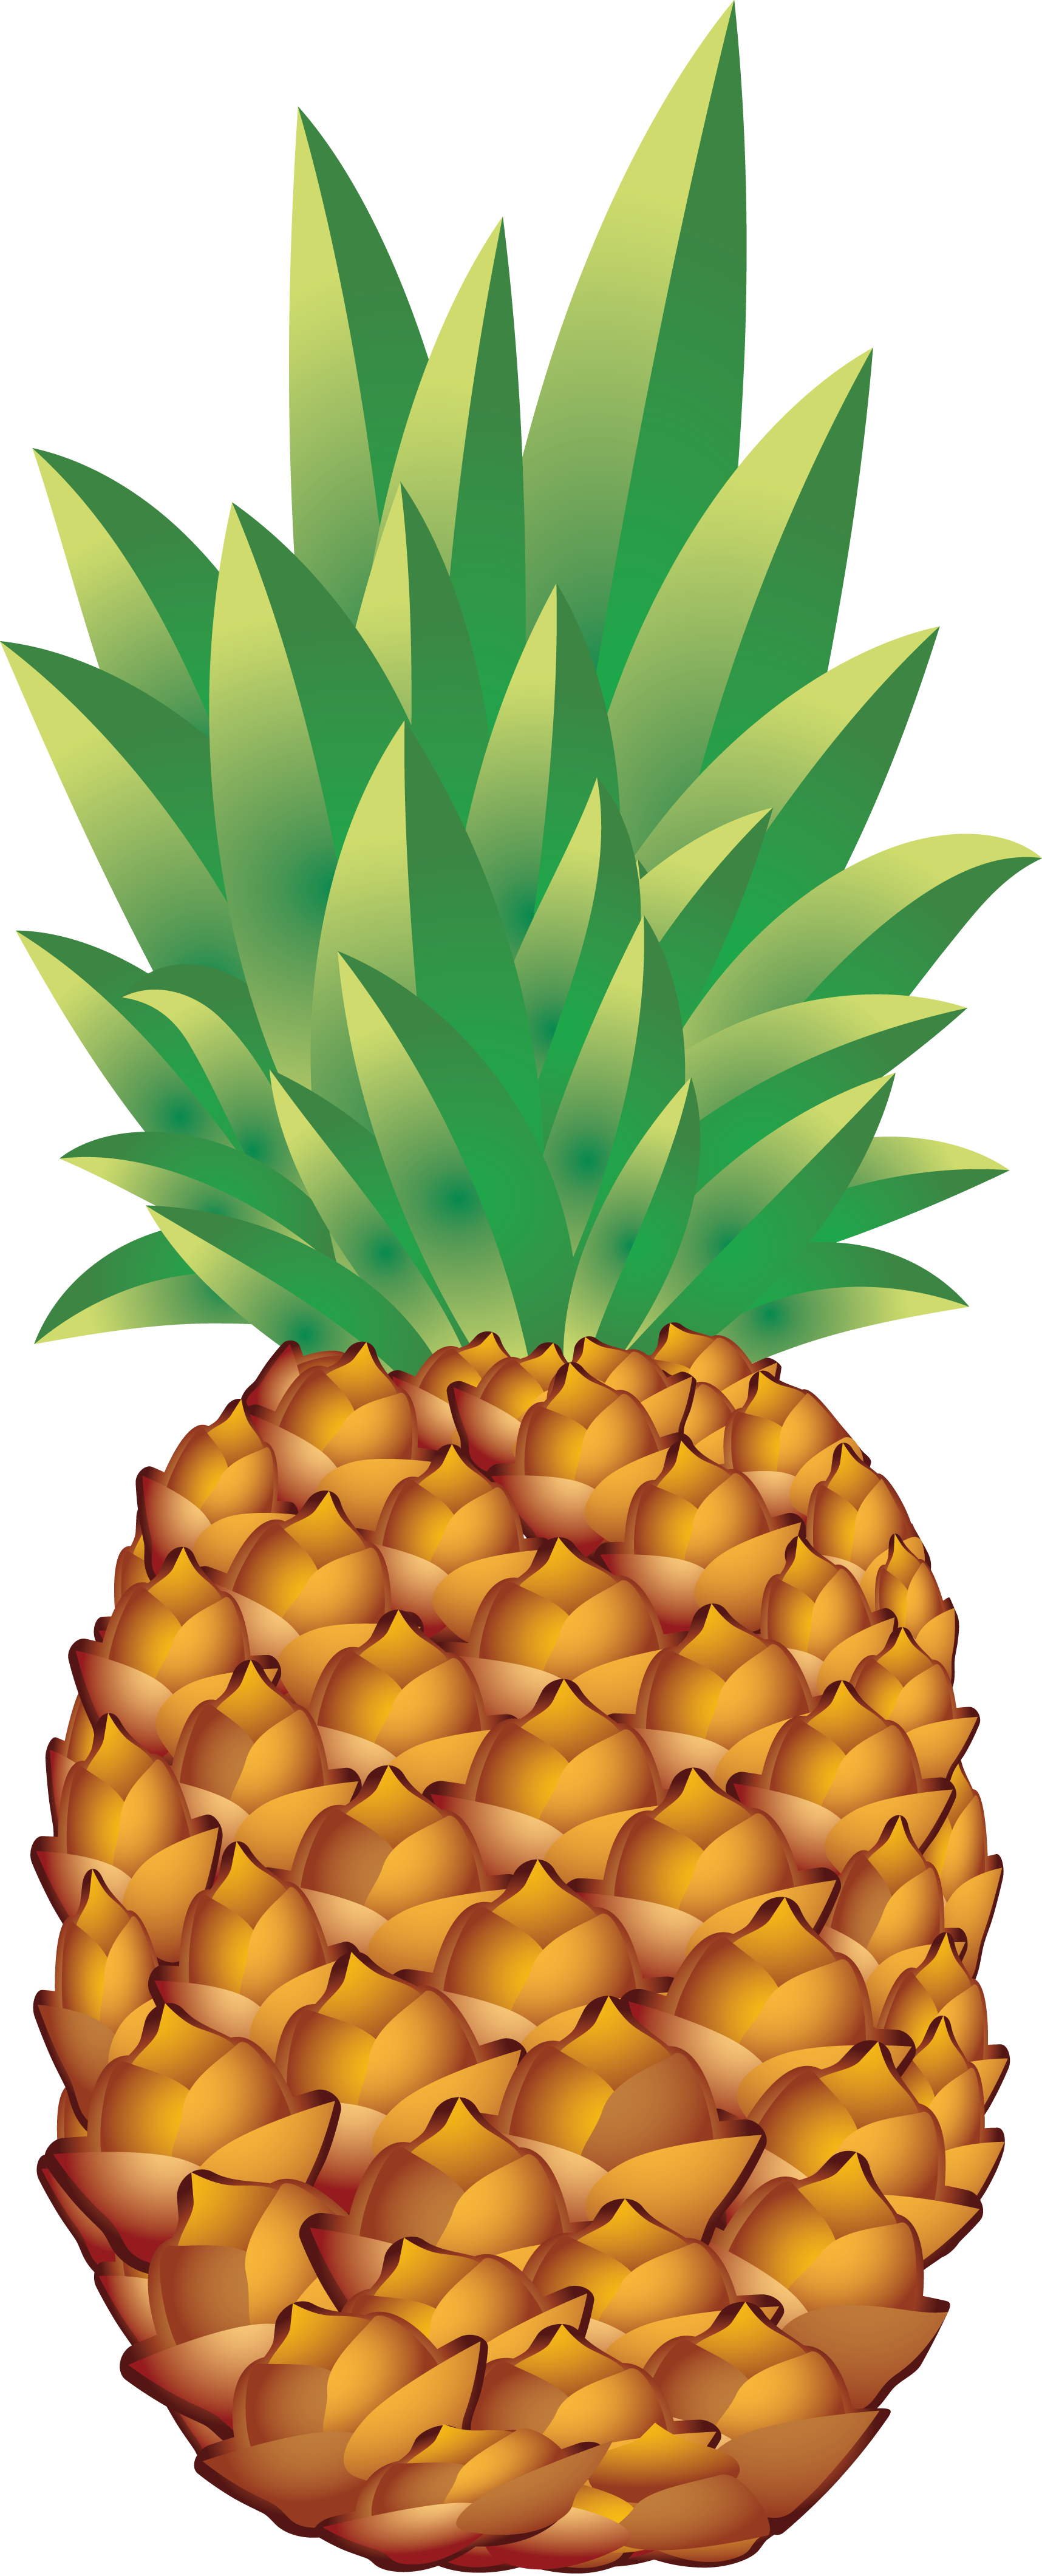 tumblr pineapple Google Search Pinapple, Pineapple